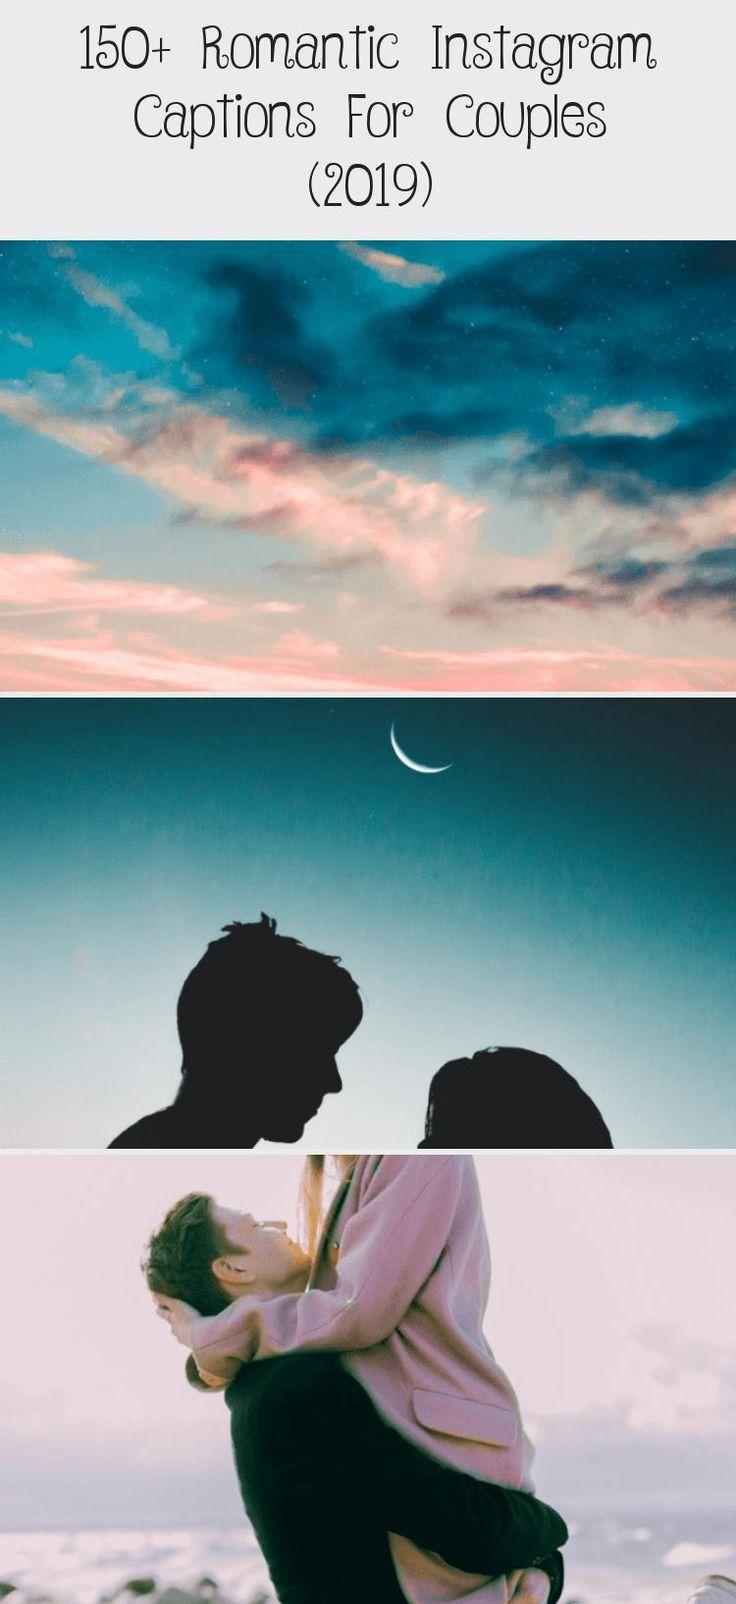 150+ Romantic Instagram Captions For Couples (2019 ...